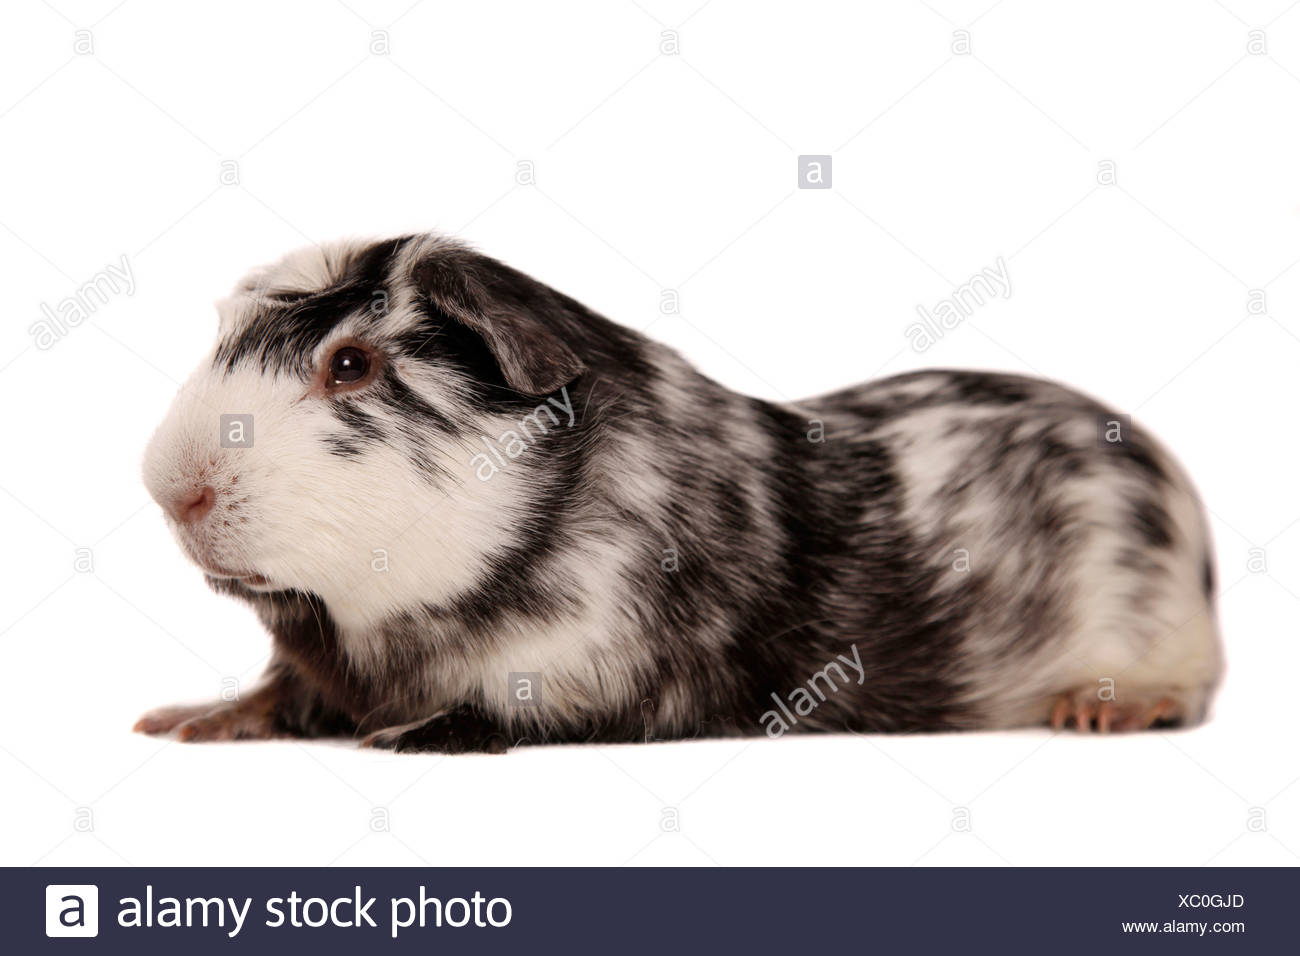 Cuy - Riesenmeerschwein Stock Photo